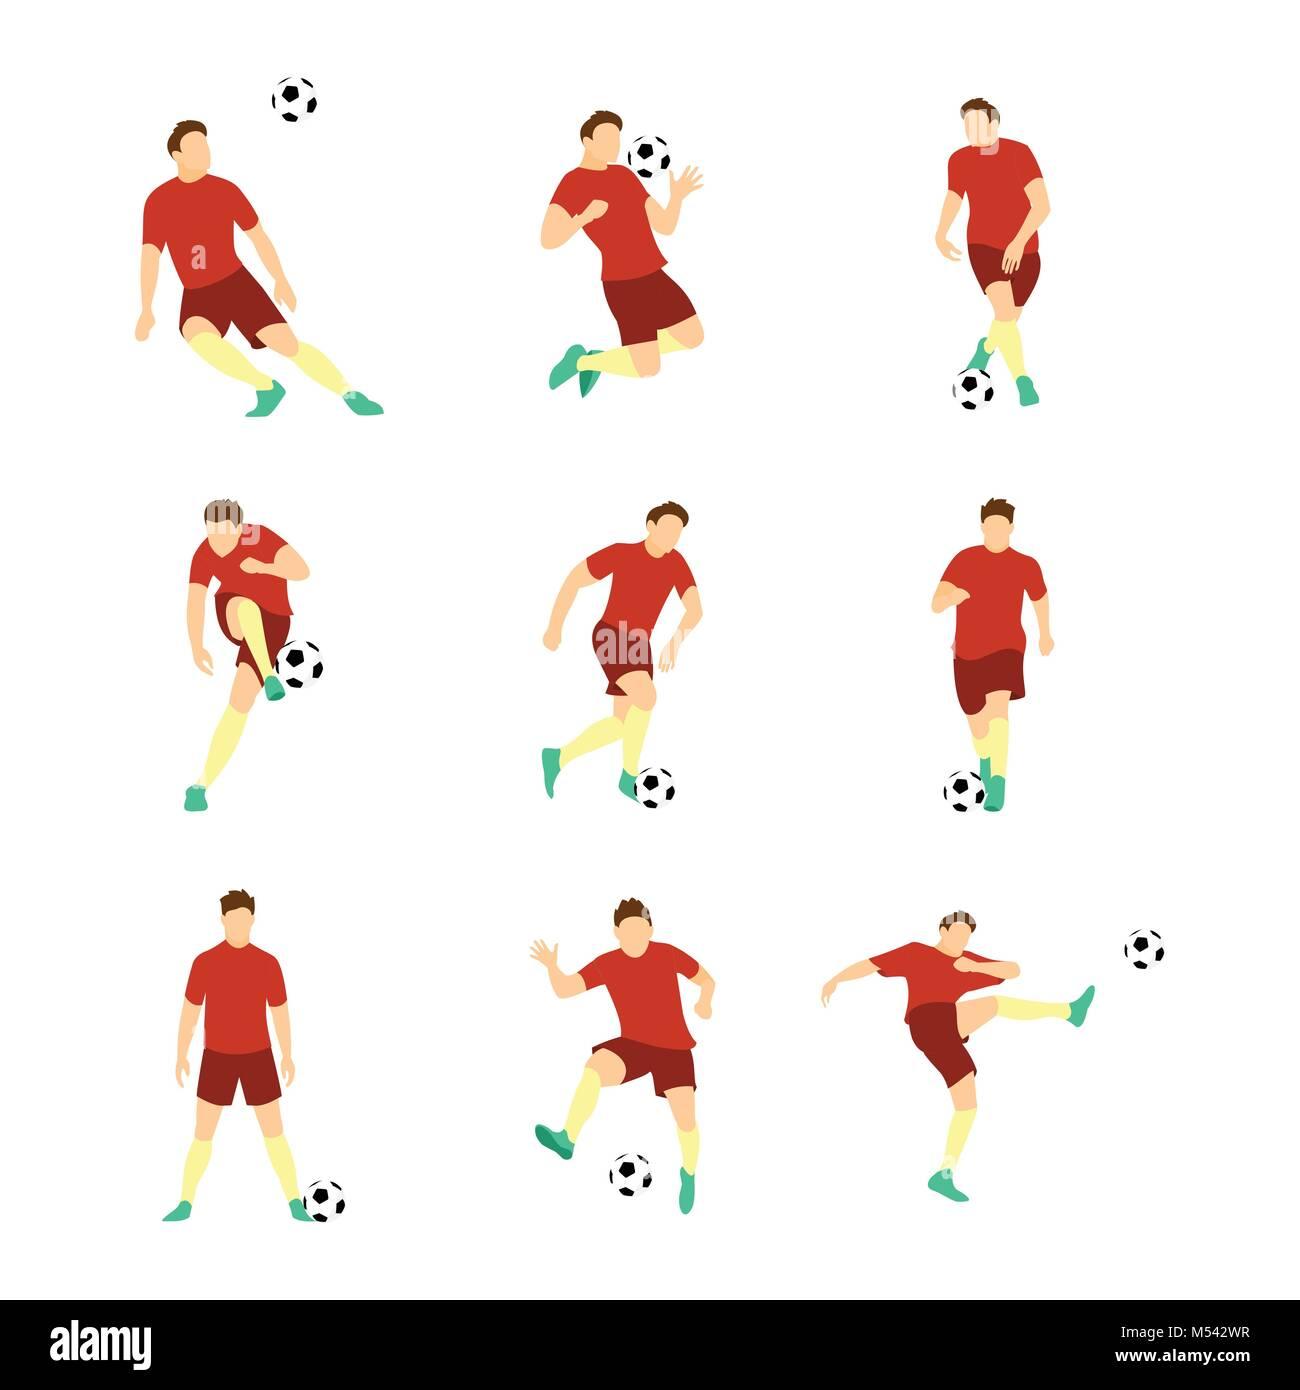 Various Football Soccer Player Vector Illustration Graphic Design Set - Stock Vector